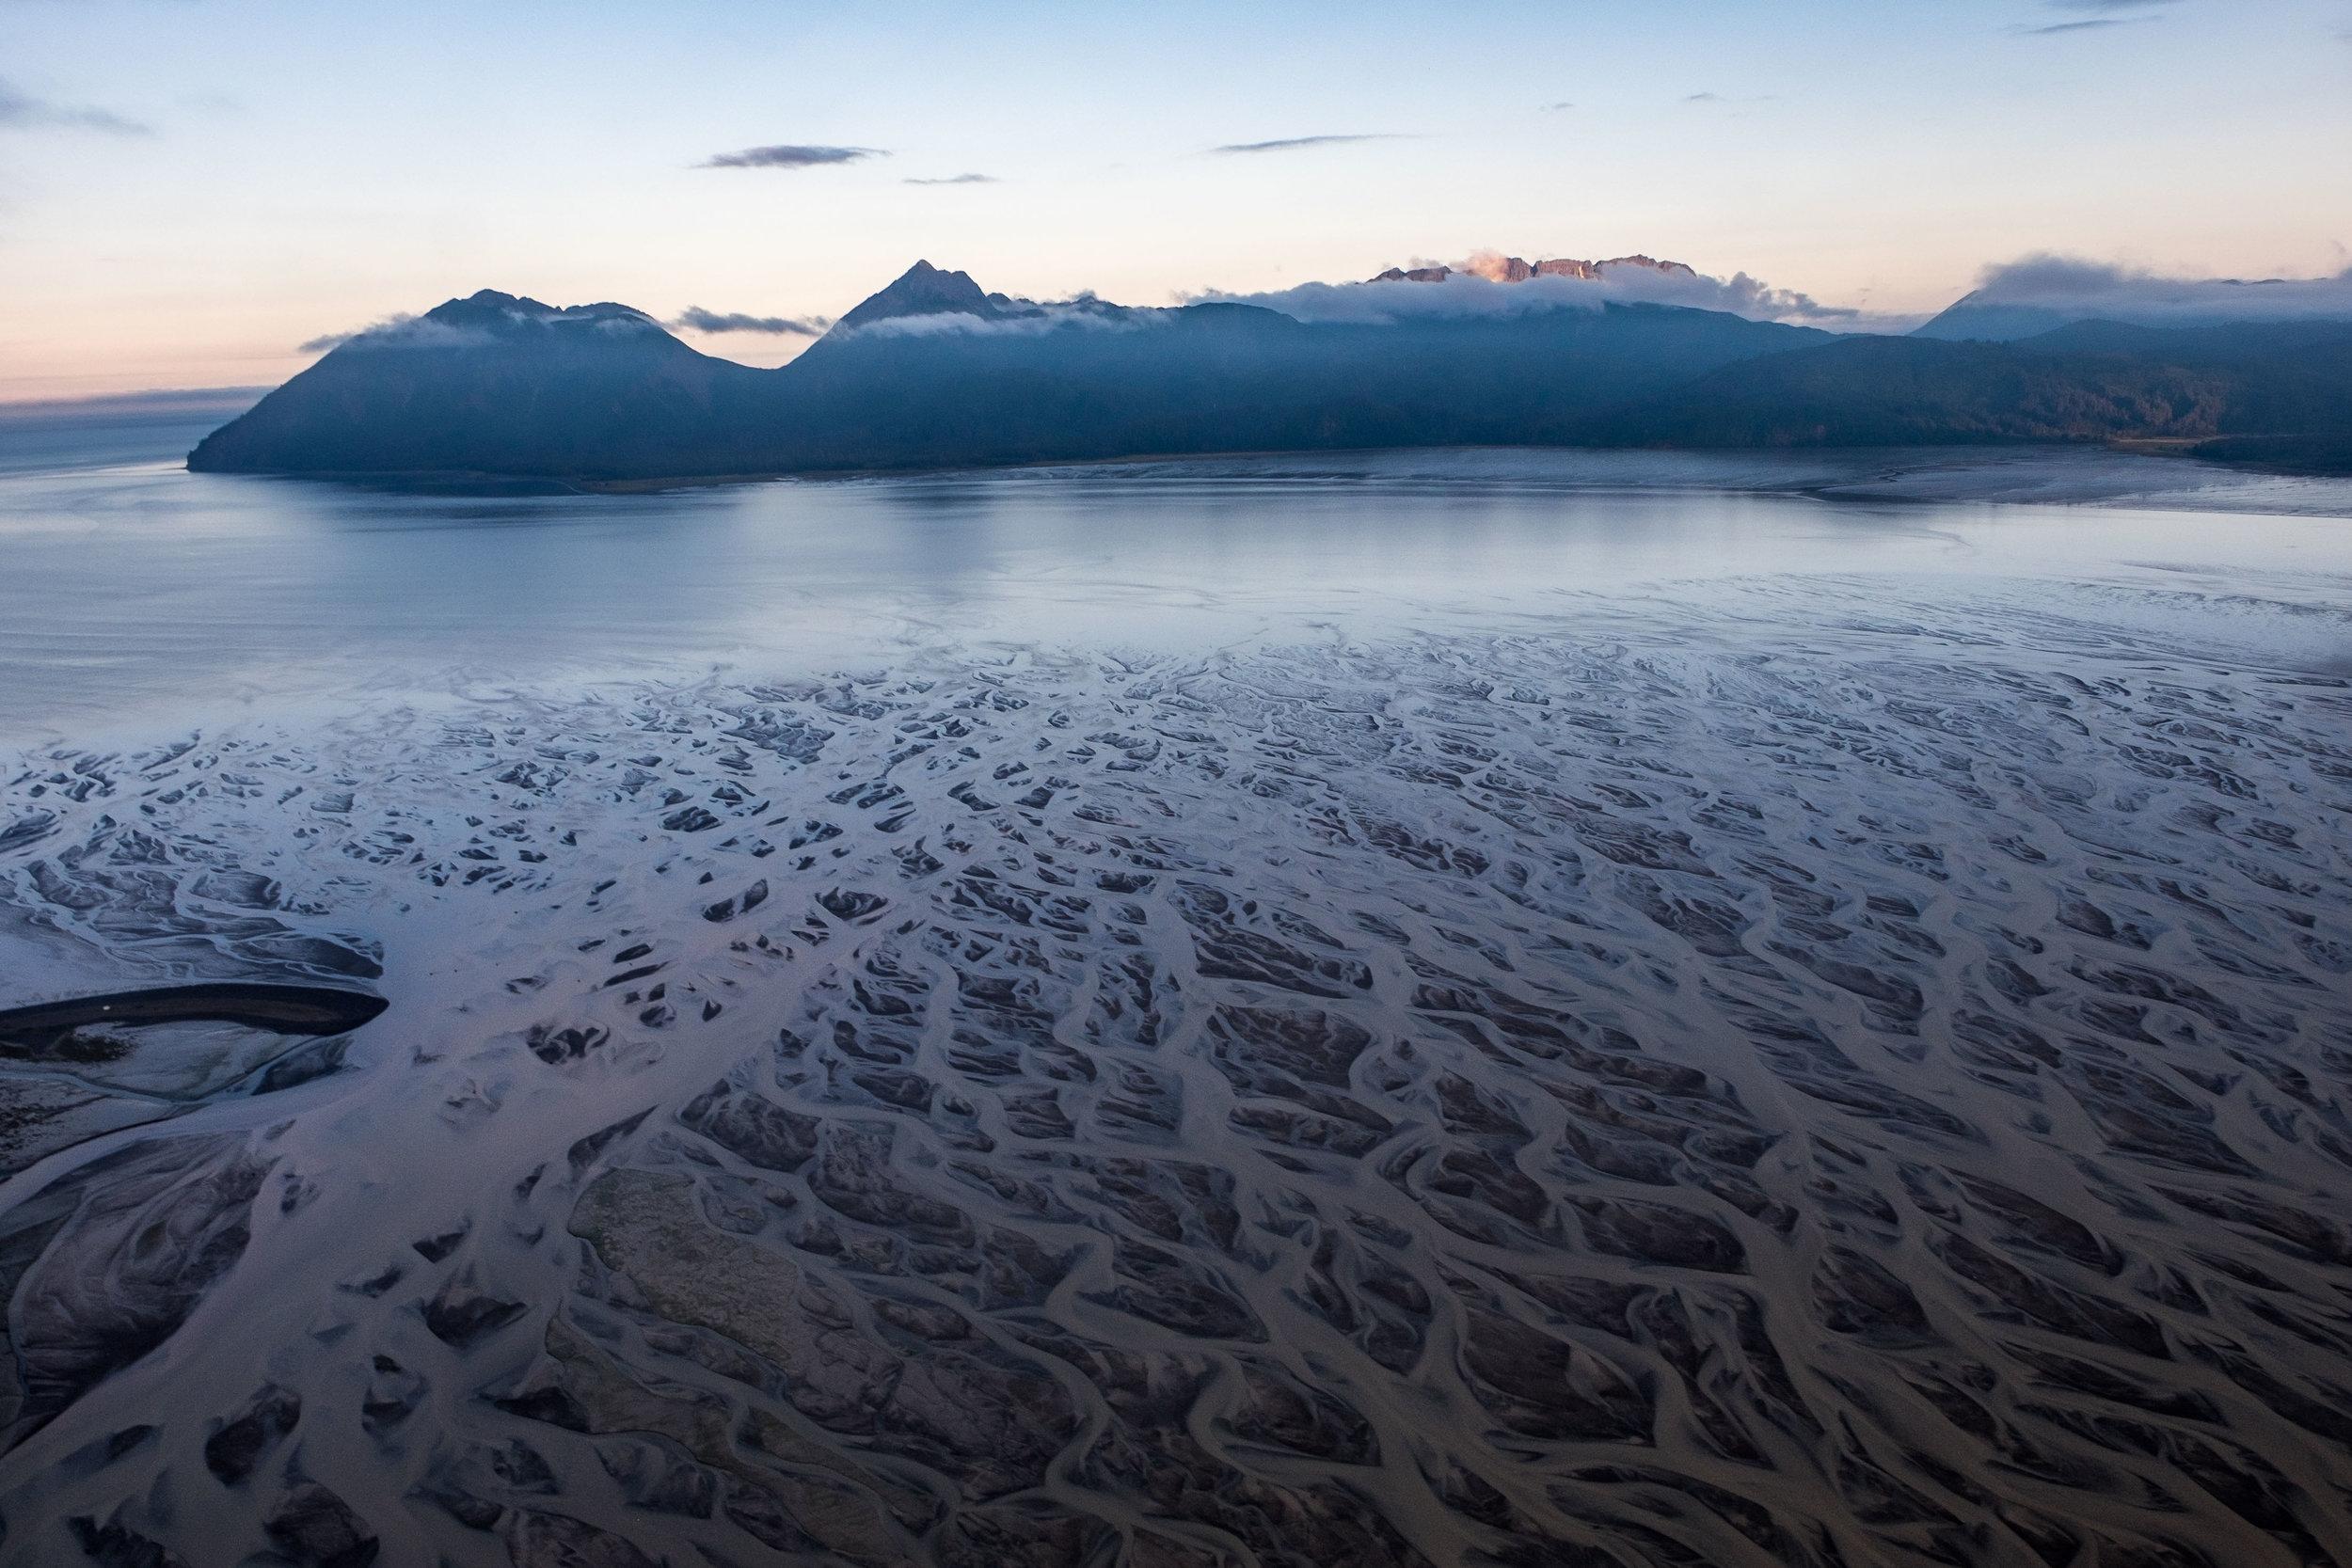 20160819-JI-Lake Clark National Park-_DSF2858.jpg